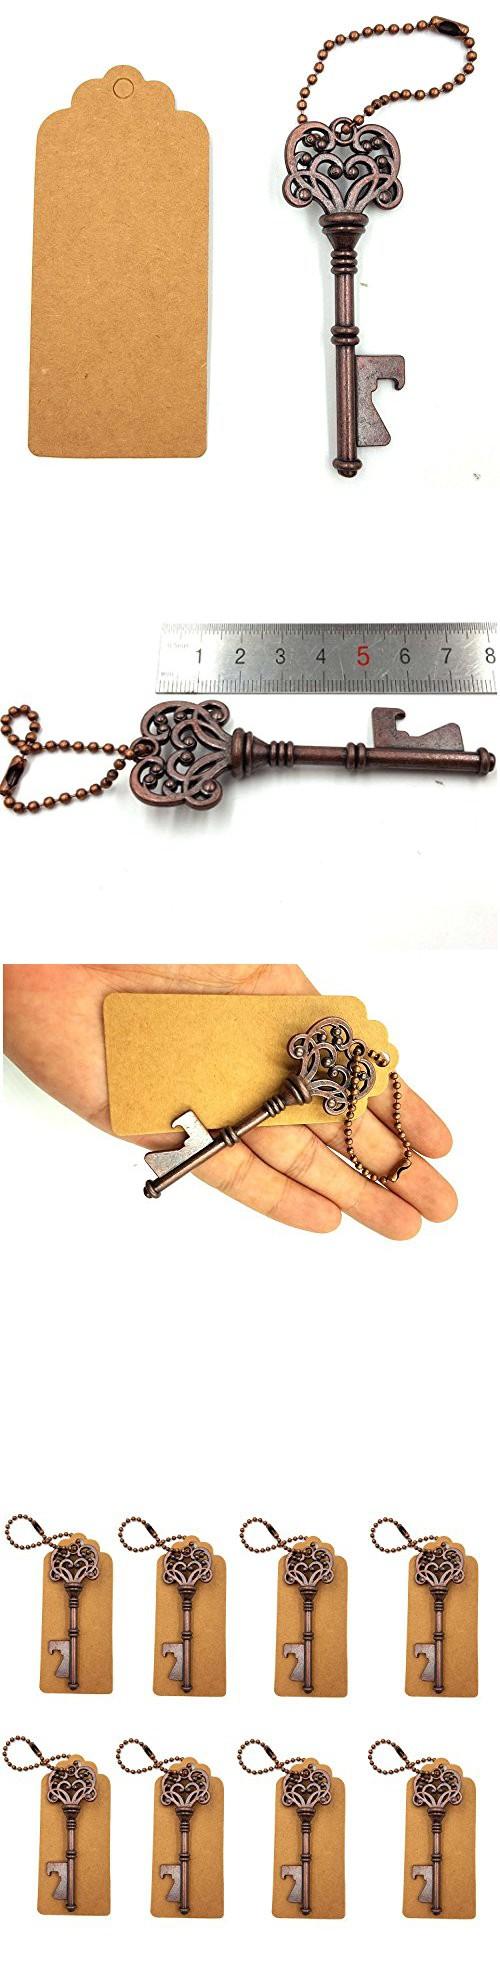 DerBlue 60 PCS Skeleton Key Bottle Openers Wedding Favors Antique ...